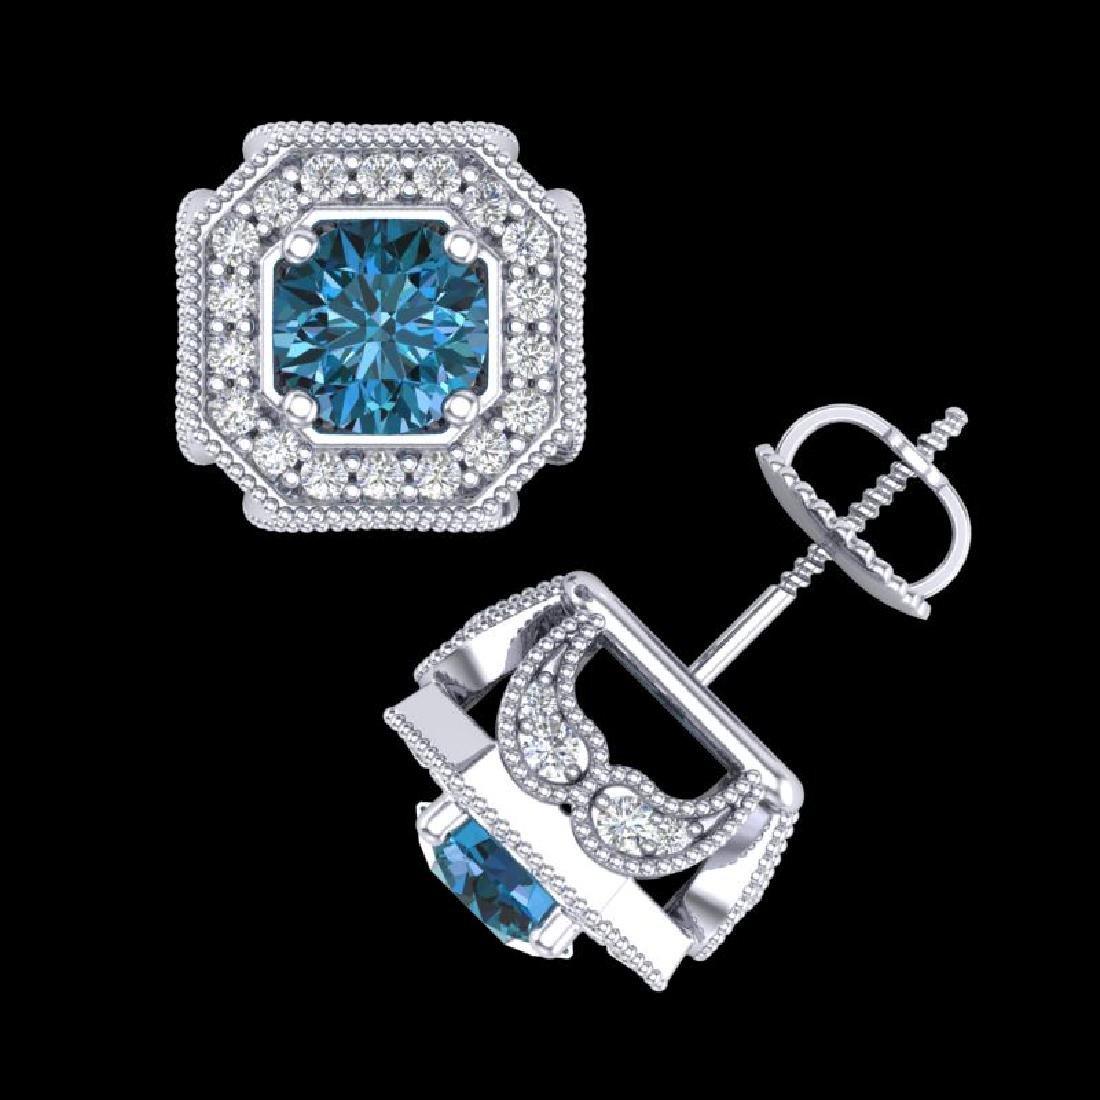 2.75 CTW Fancy Intense Blue Diamond Art Deco Stud - 3